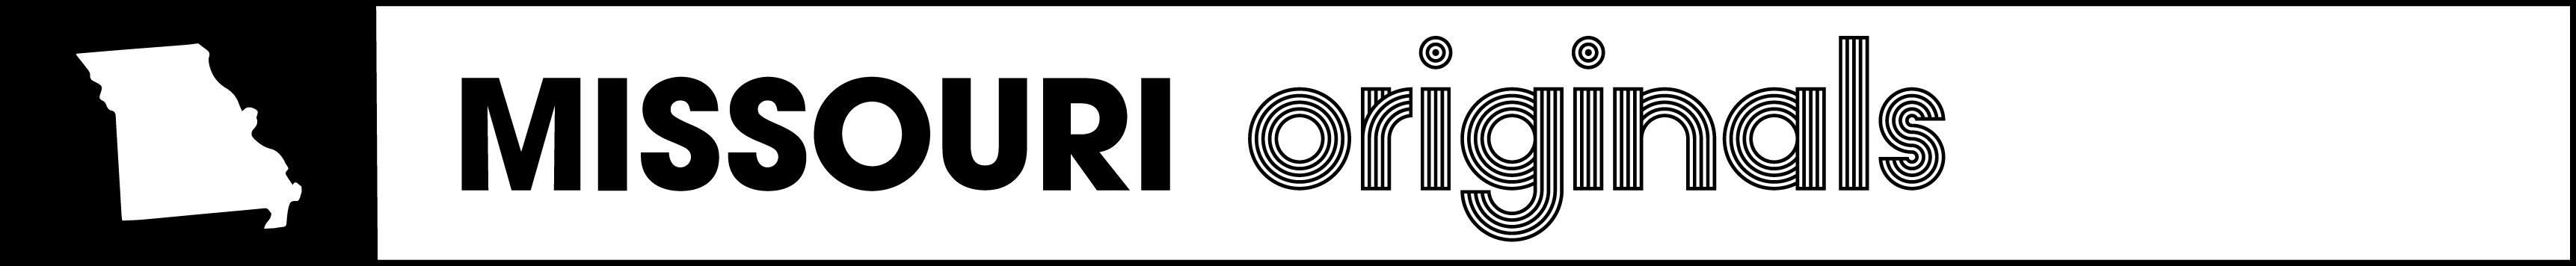 Mo banner